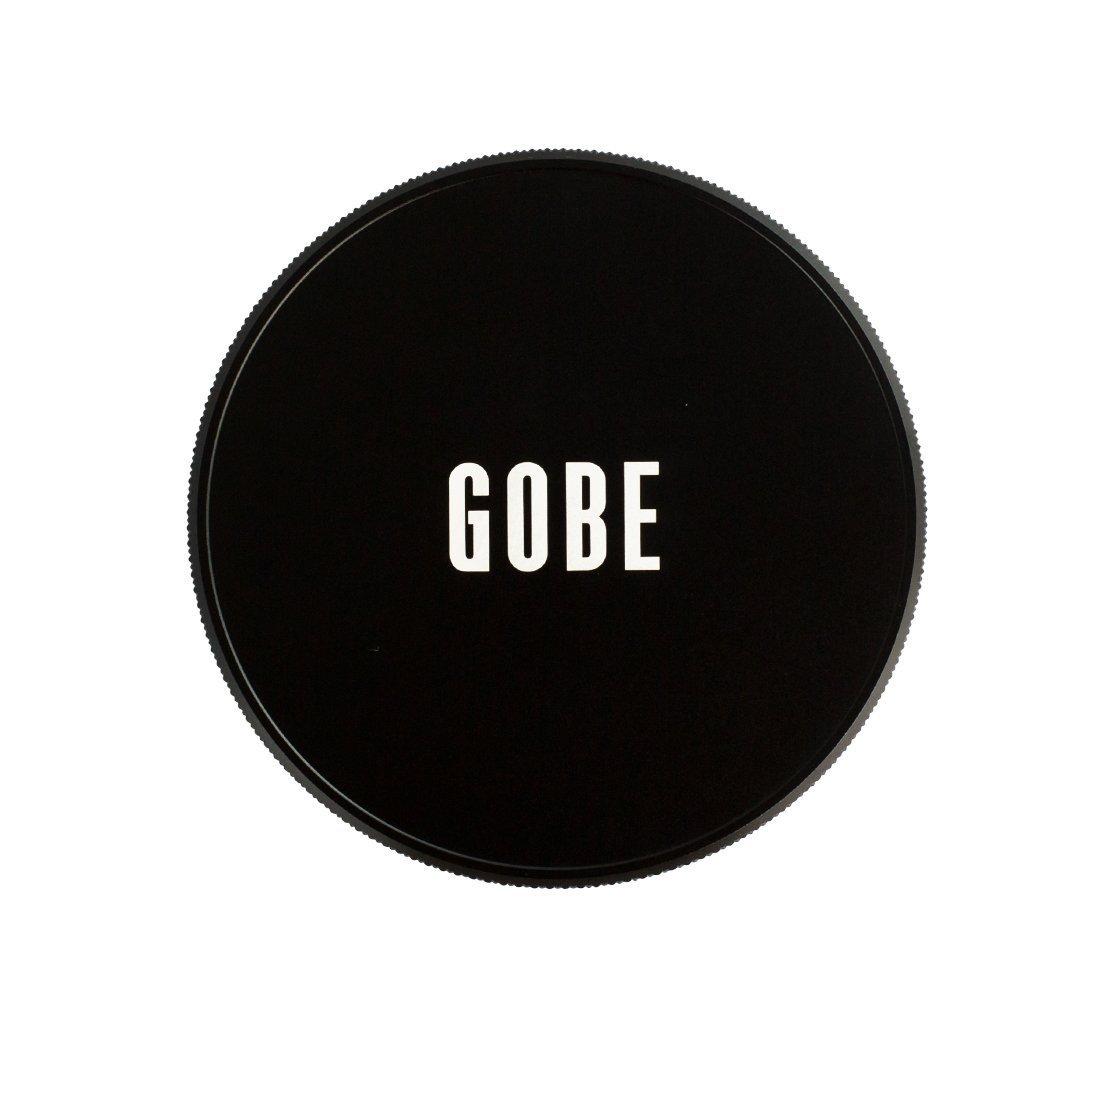 Gobe Lens Filter Metal Caps 37mm by Gobe